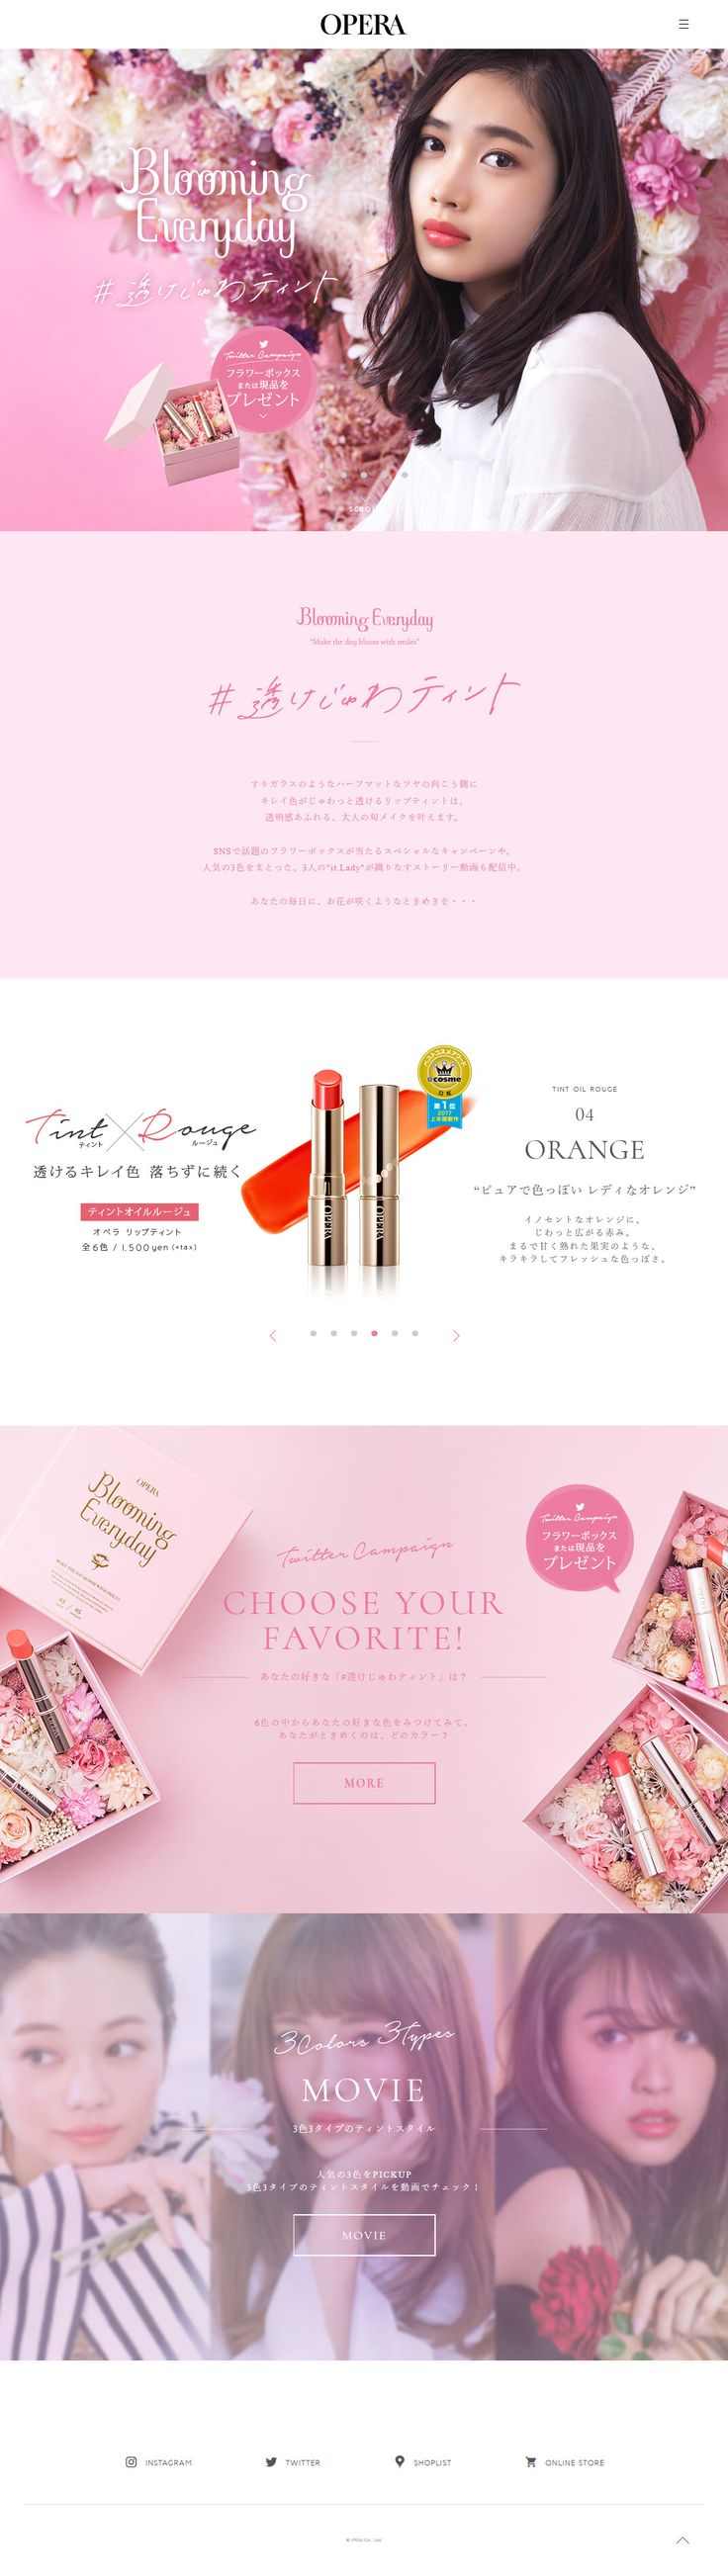 Blooming Everyday #透けじゅわティント OPERA(オペラ) http://opera-net.jp/special/2017june/